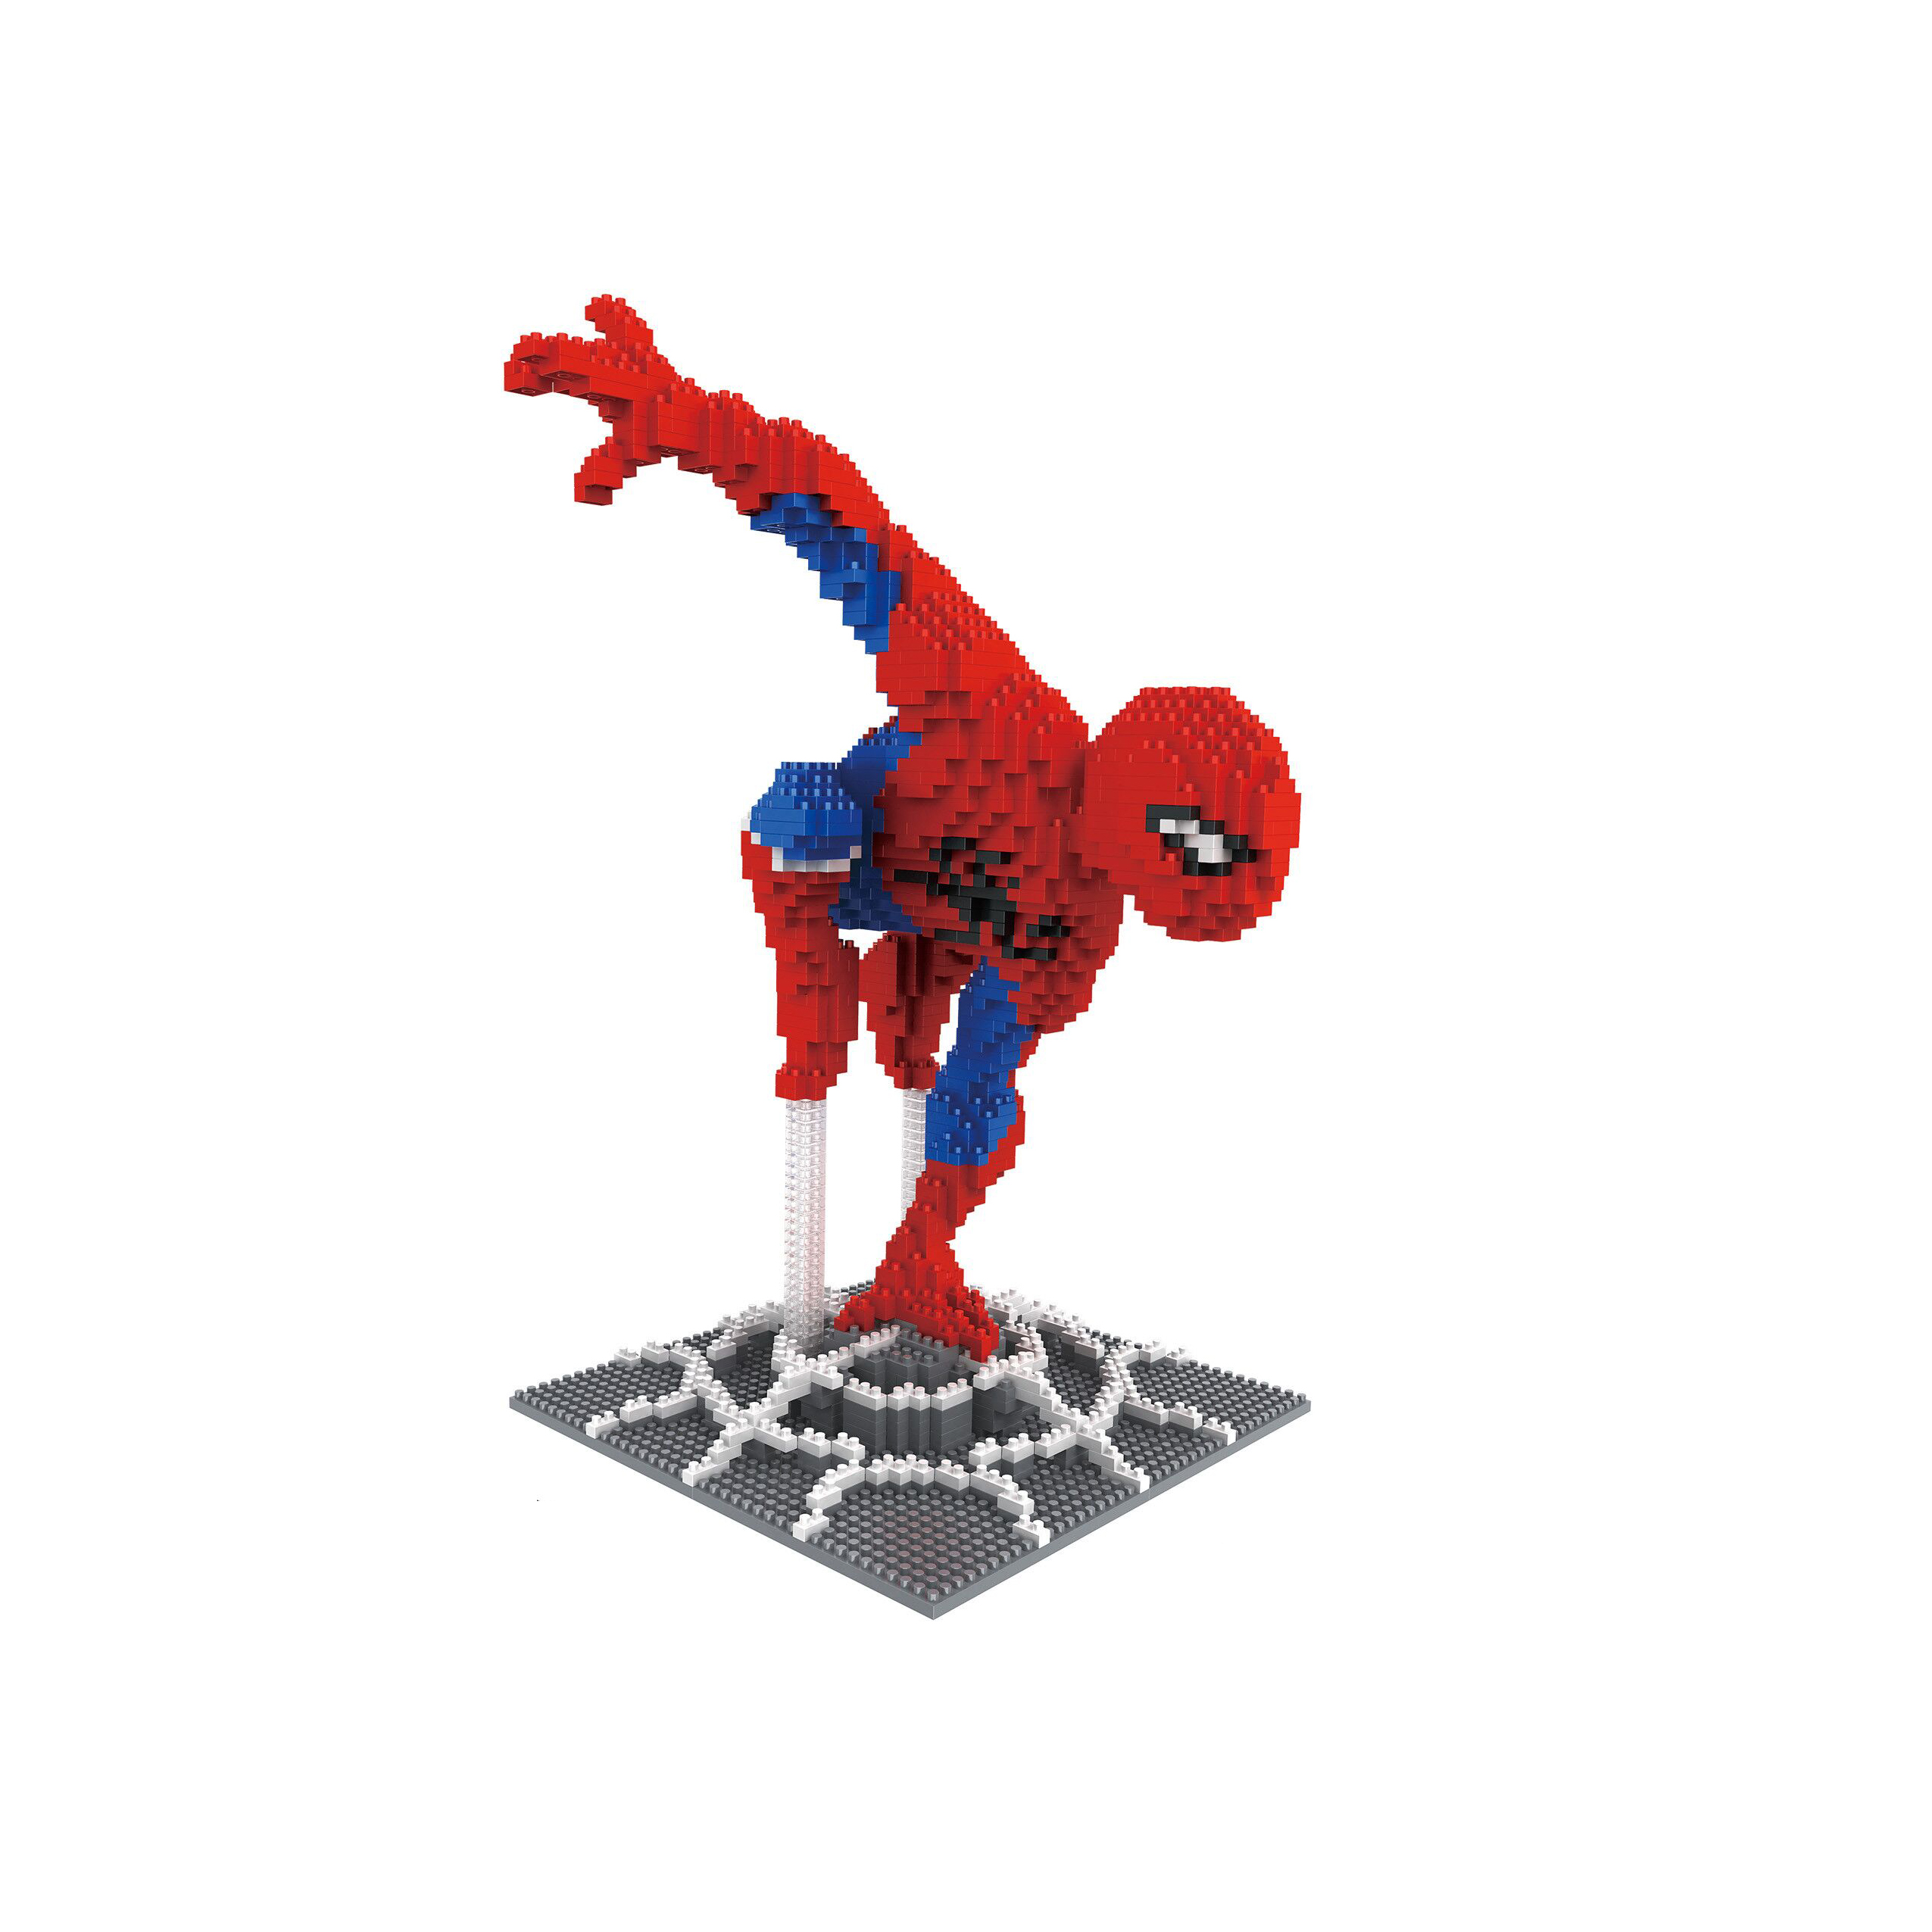 New Coming Super Hero Design Block with Cheap Price DIY Mini Mirco Diamond Building Blocks Bricks Toys Kids Gift 7